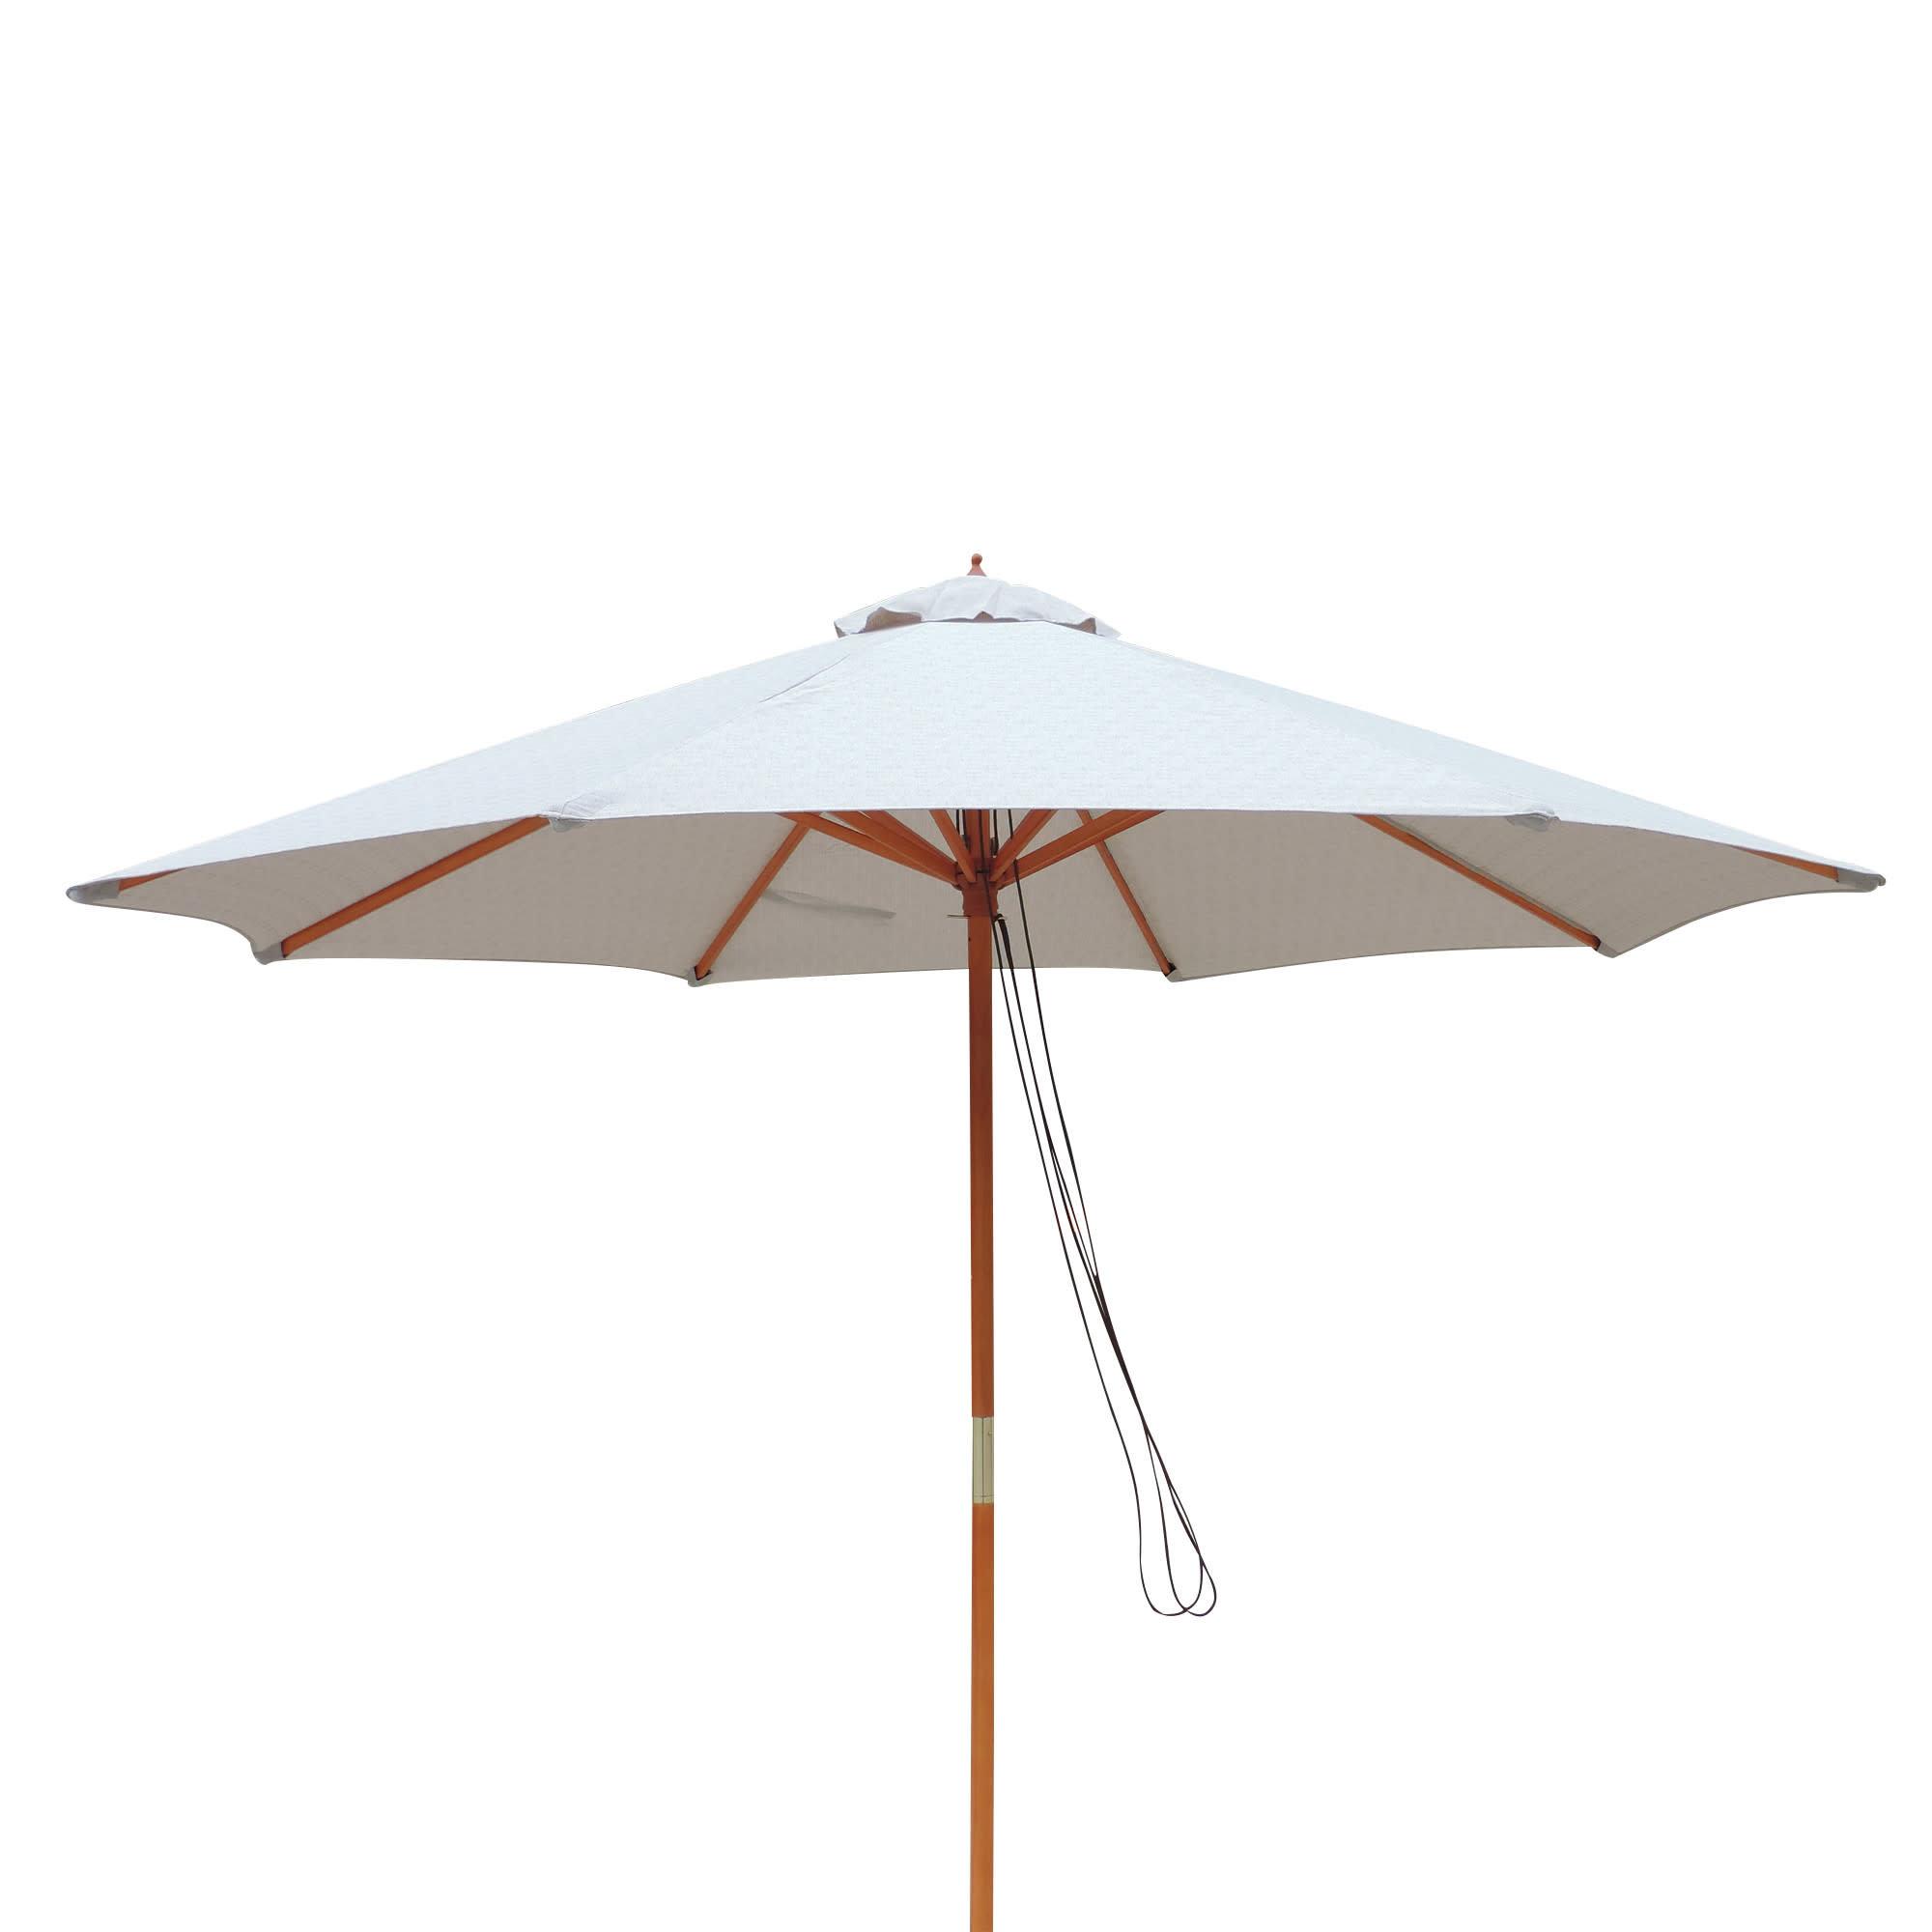 Camelford 9' Market Umbrella Pertaining To Recent Cannock Market Umbrellas (View 4 of 20)